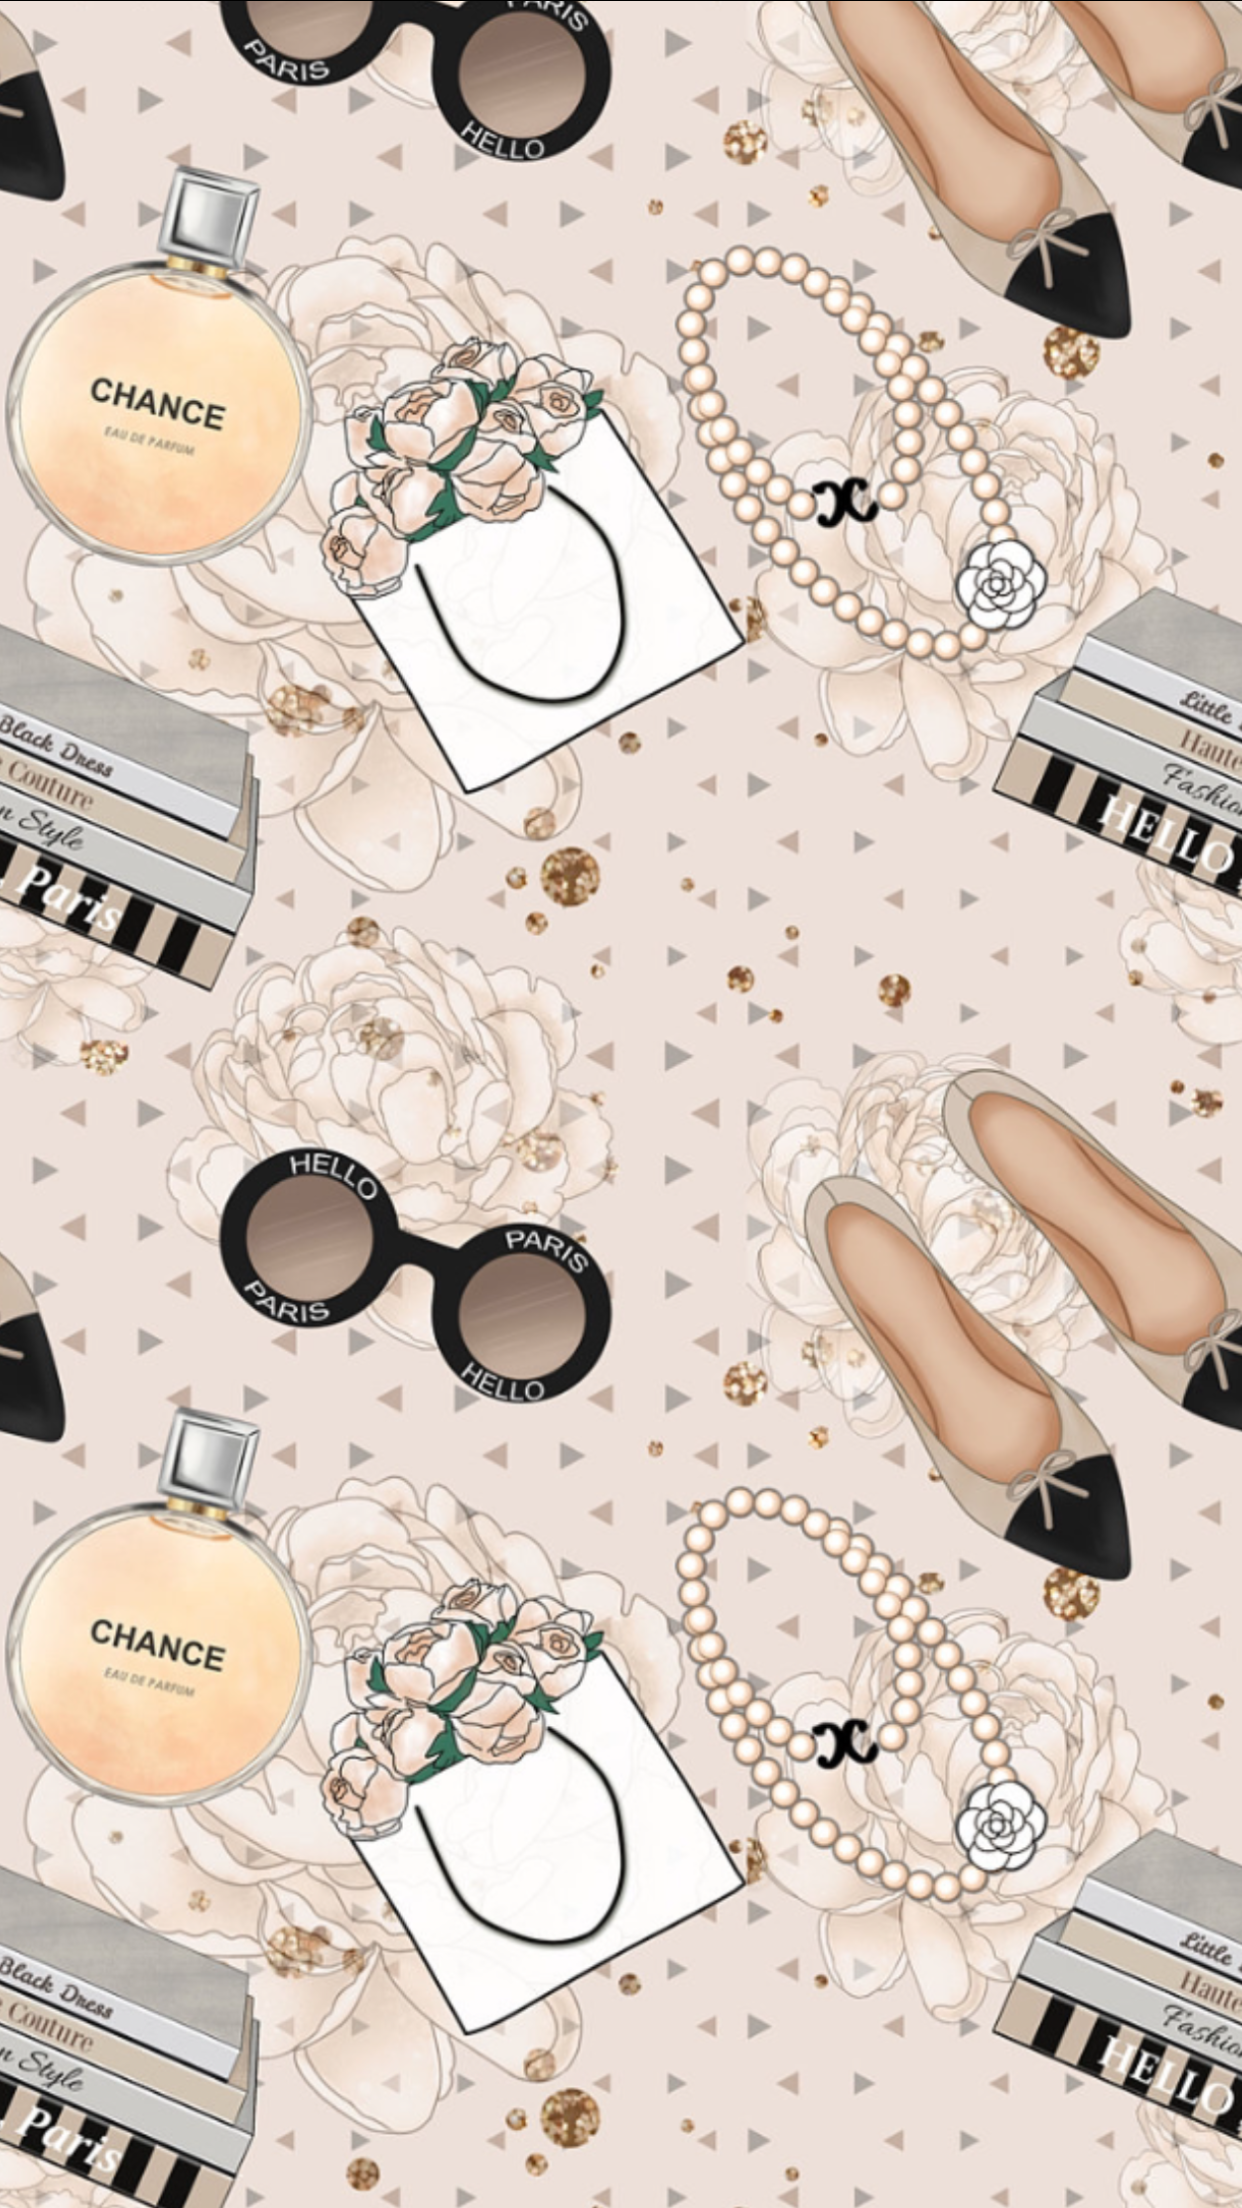 Breakfast at Hannah's ♡ | iphone cases | wallpapers♡ in 2019 | おしゃれな壁紙背景, イラスト おしゃれ, 香水 イラスト